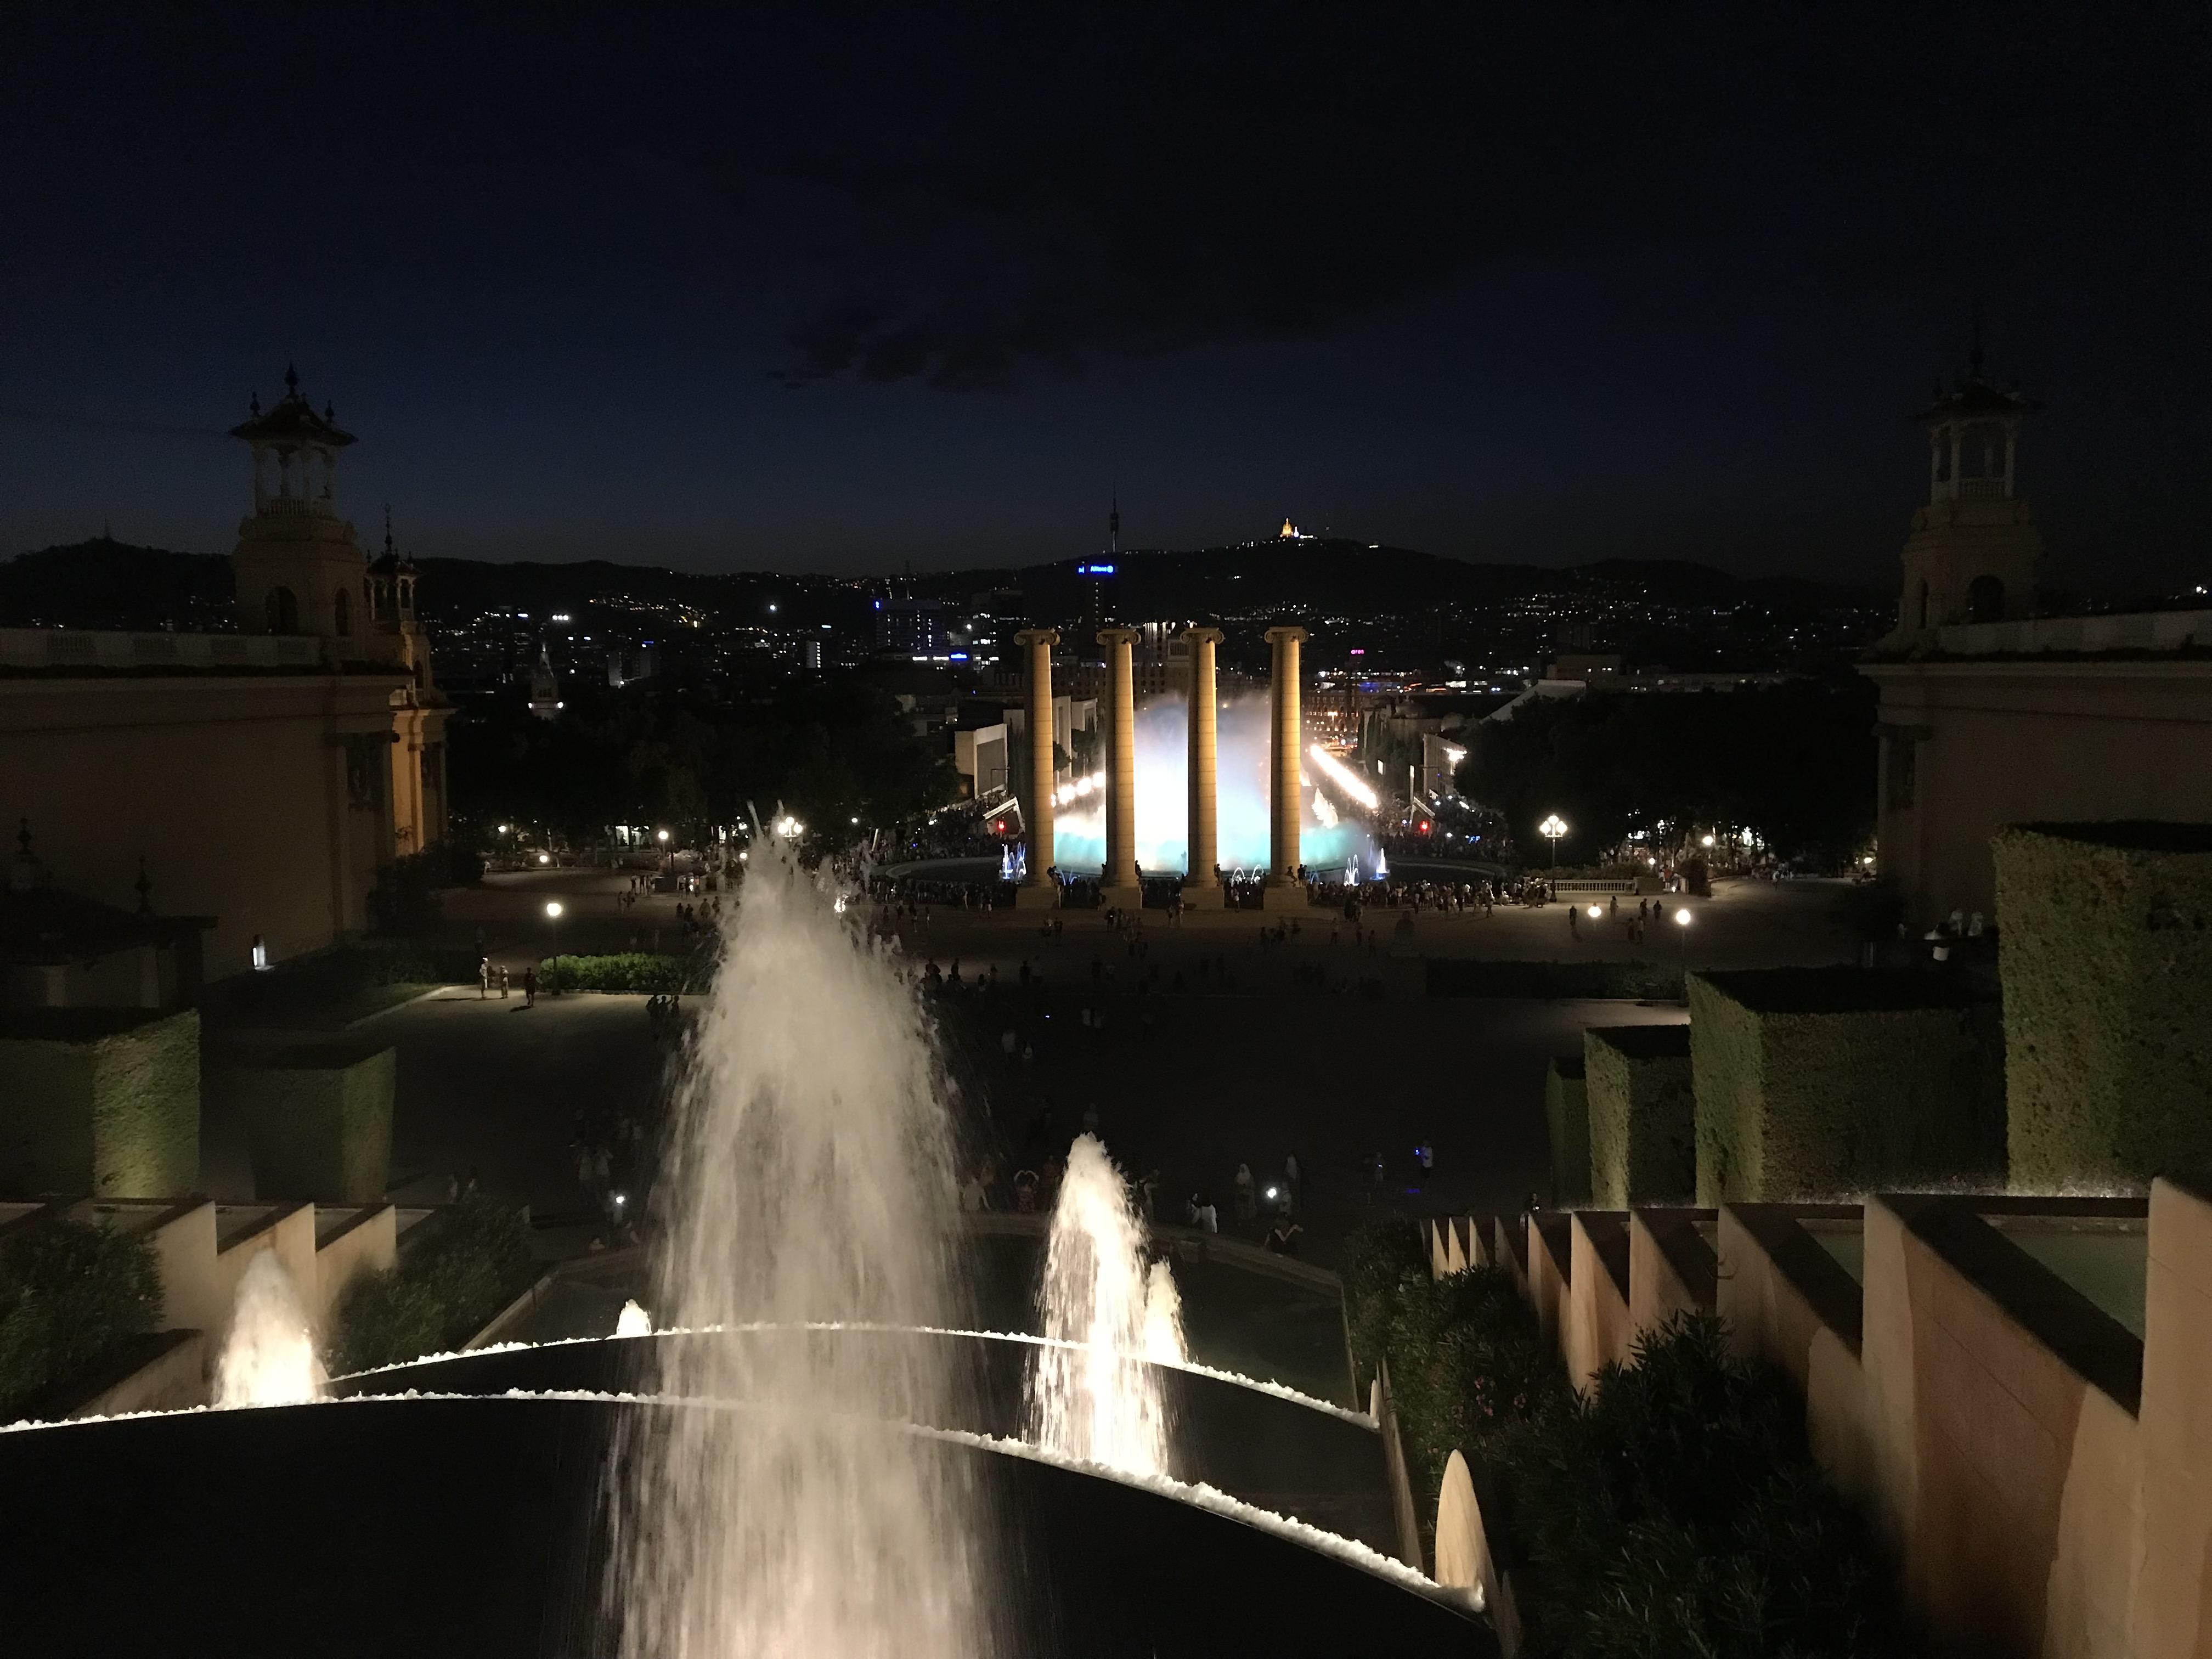 Font Màgica de Montjuïc(マジカ噴水)